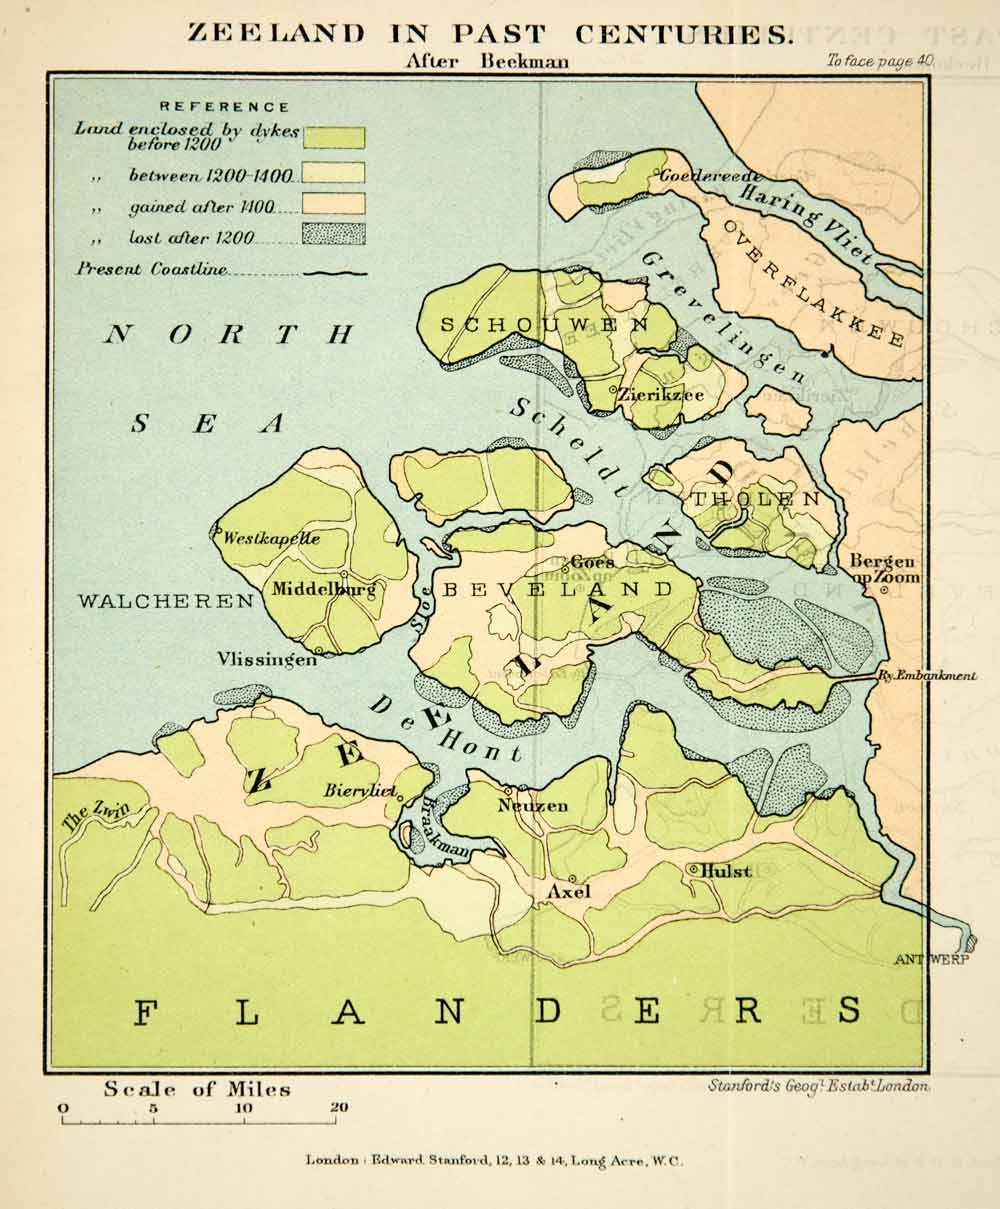 1902 Photolithographed Map Zeeland Netherlands Flanders North Sea